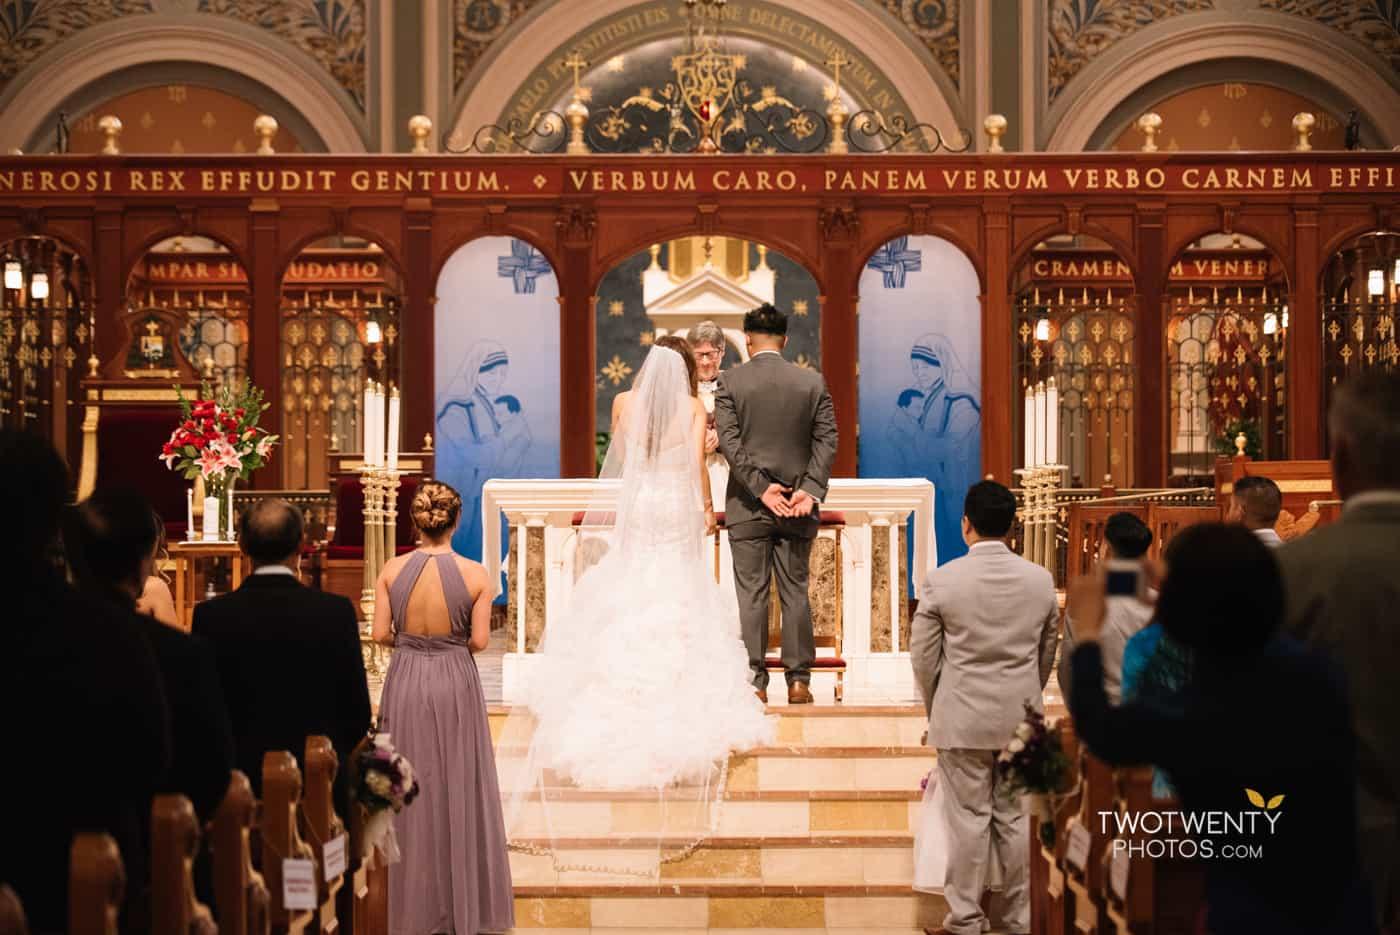 cathedral-of-the-sacred-sacrament-downtown-sacramento-wedding-photographer-12